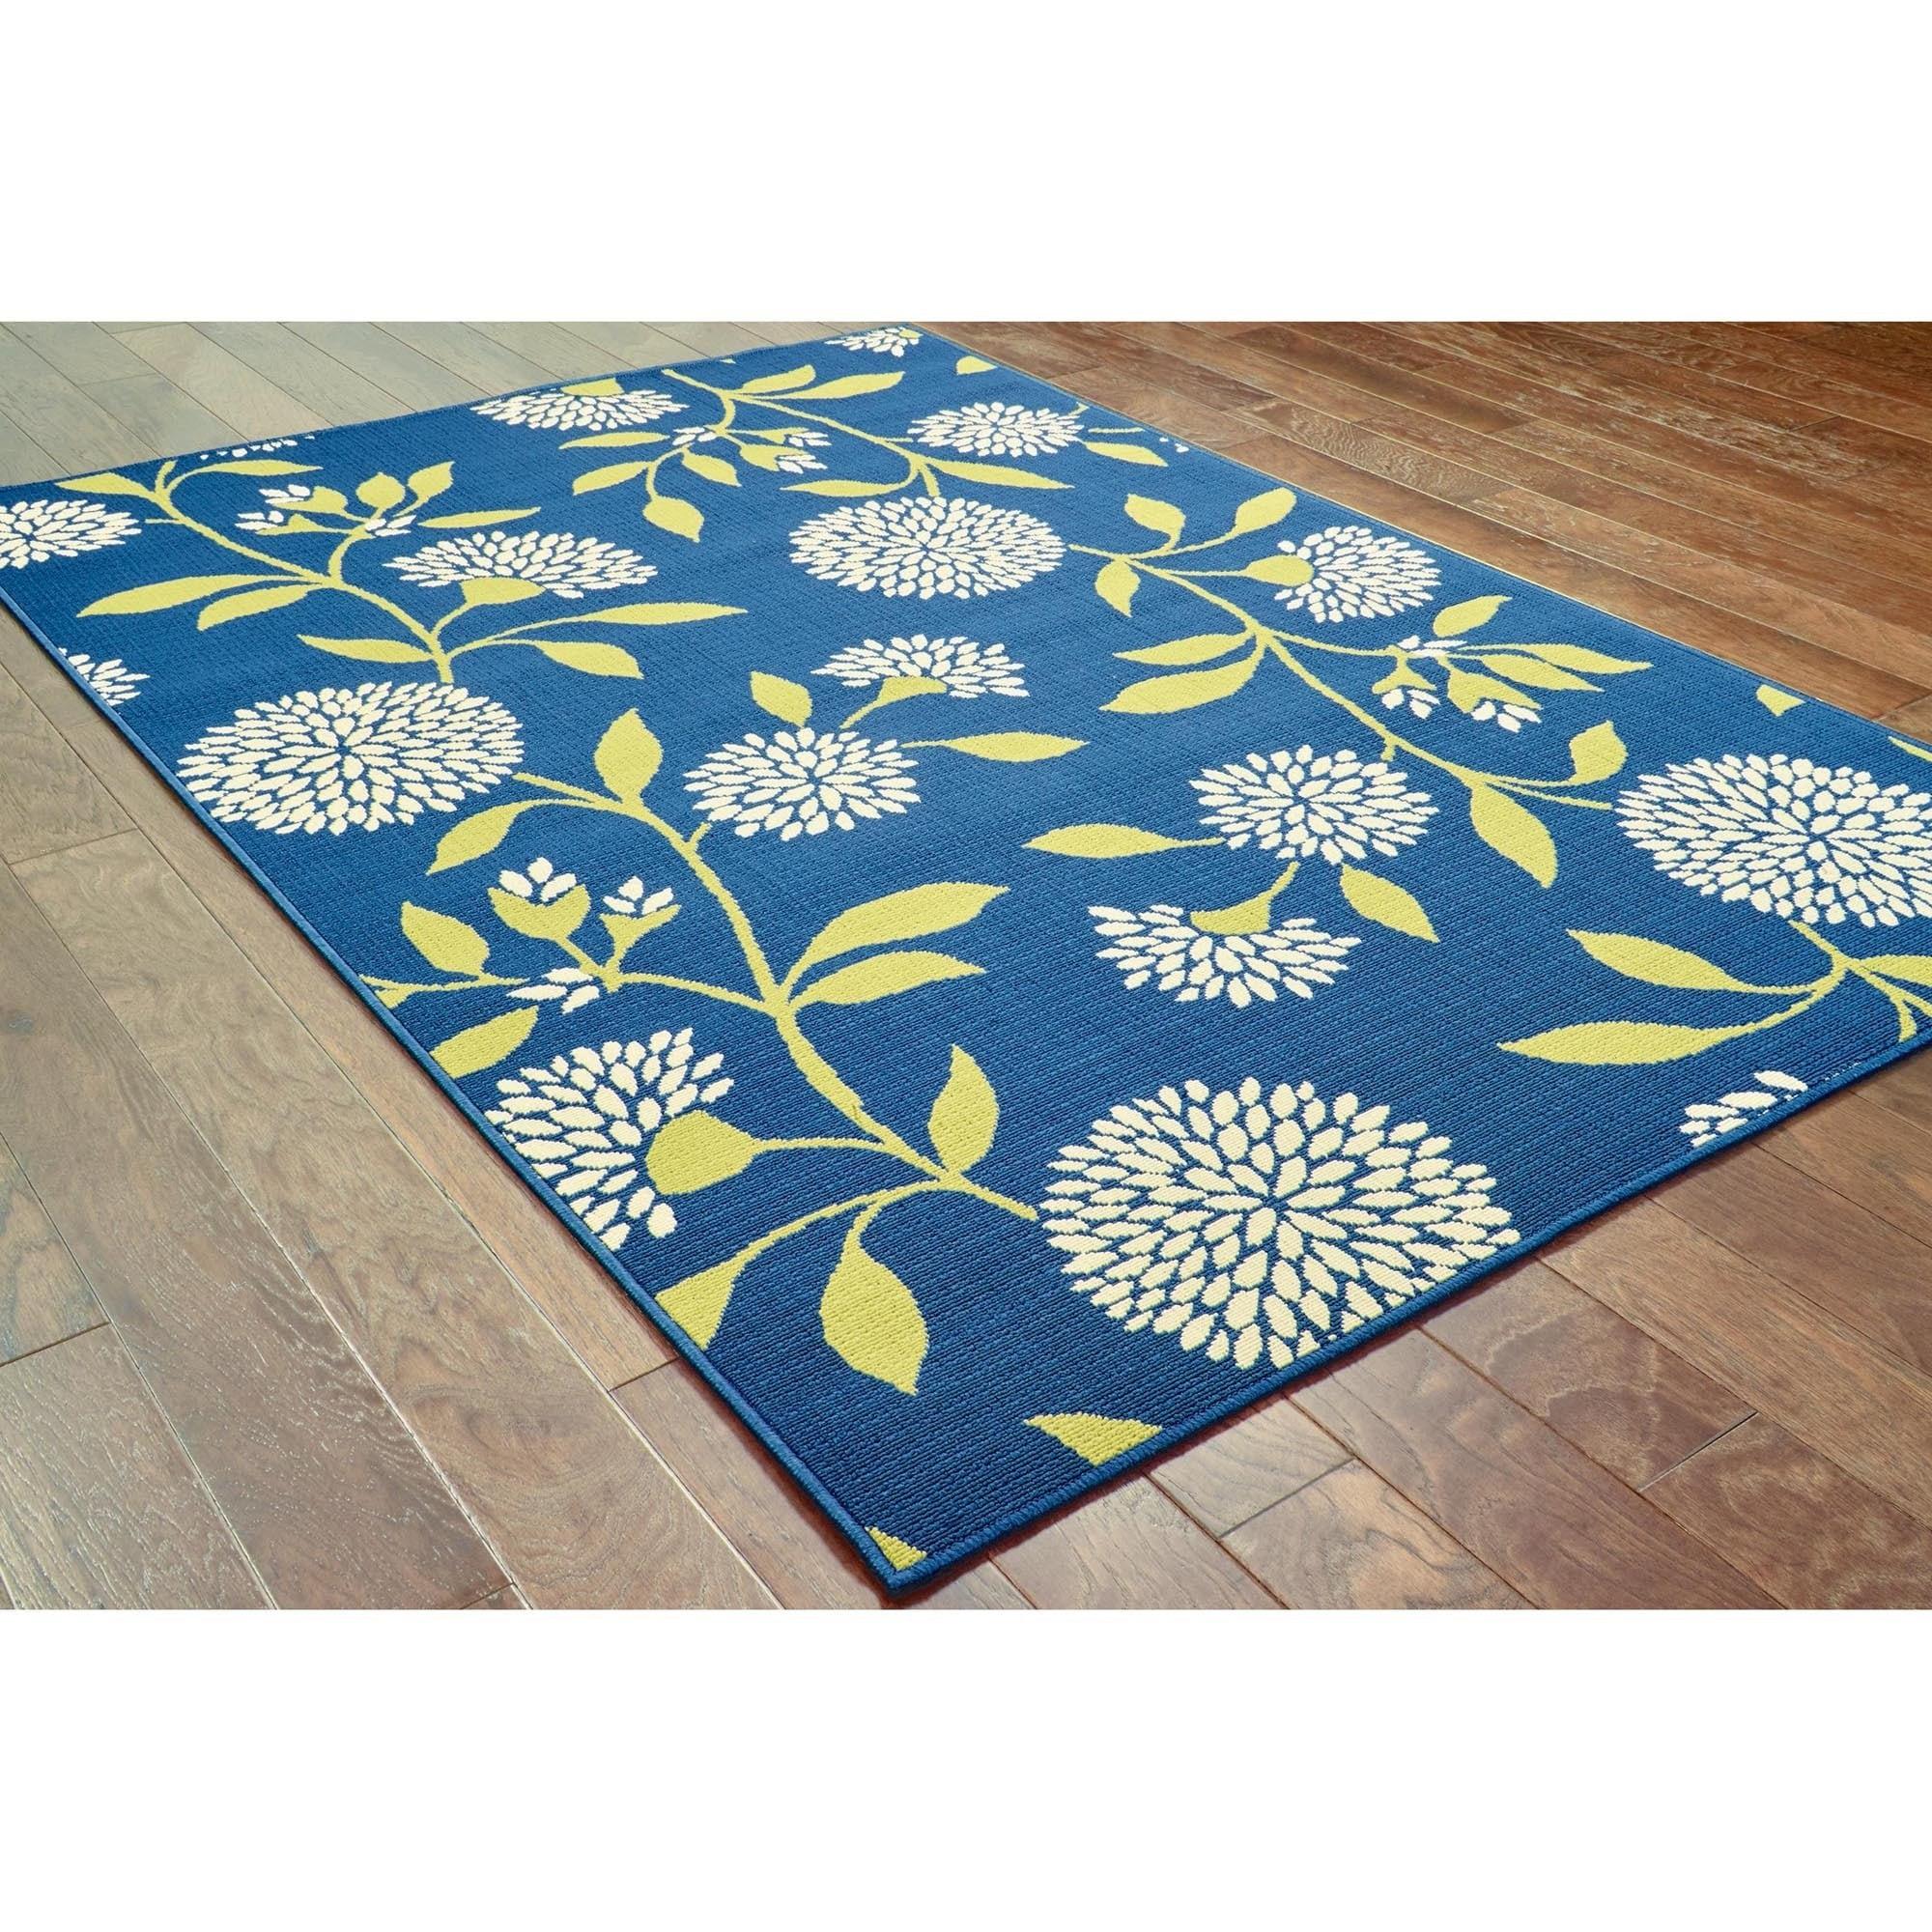 Shop Palm Canyon Cielo Floral Blue/Green Indoor/ Outdoor Area Rug ...